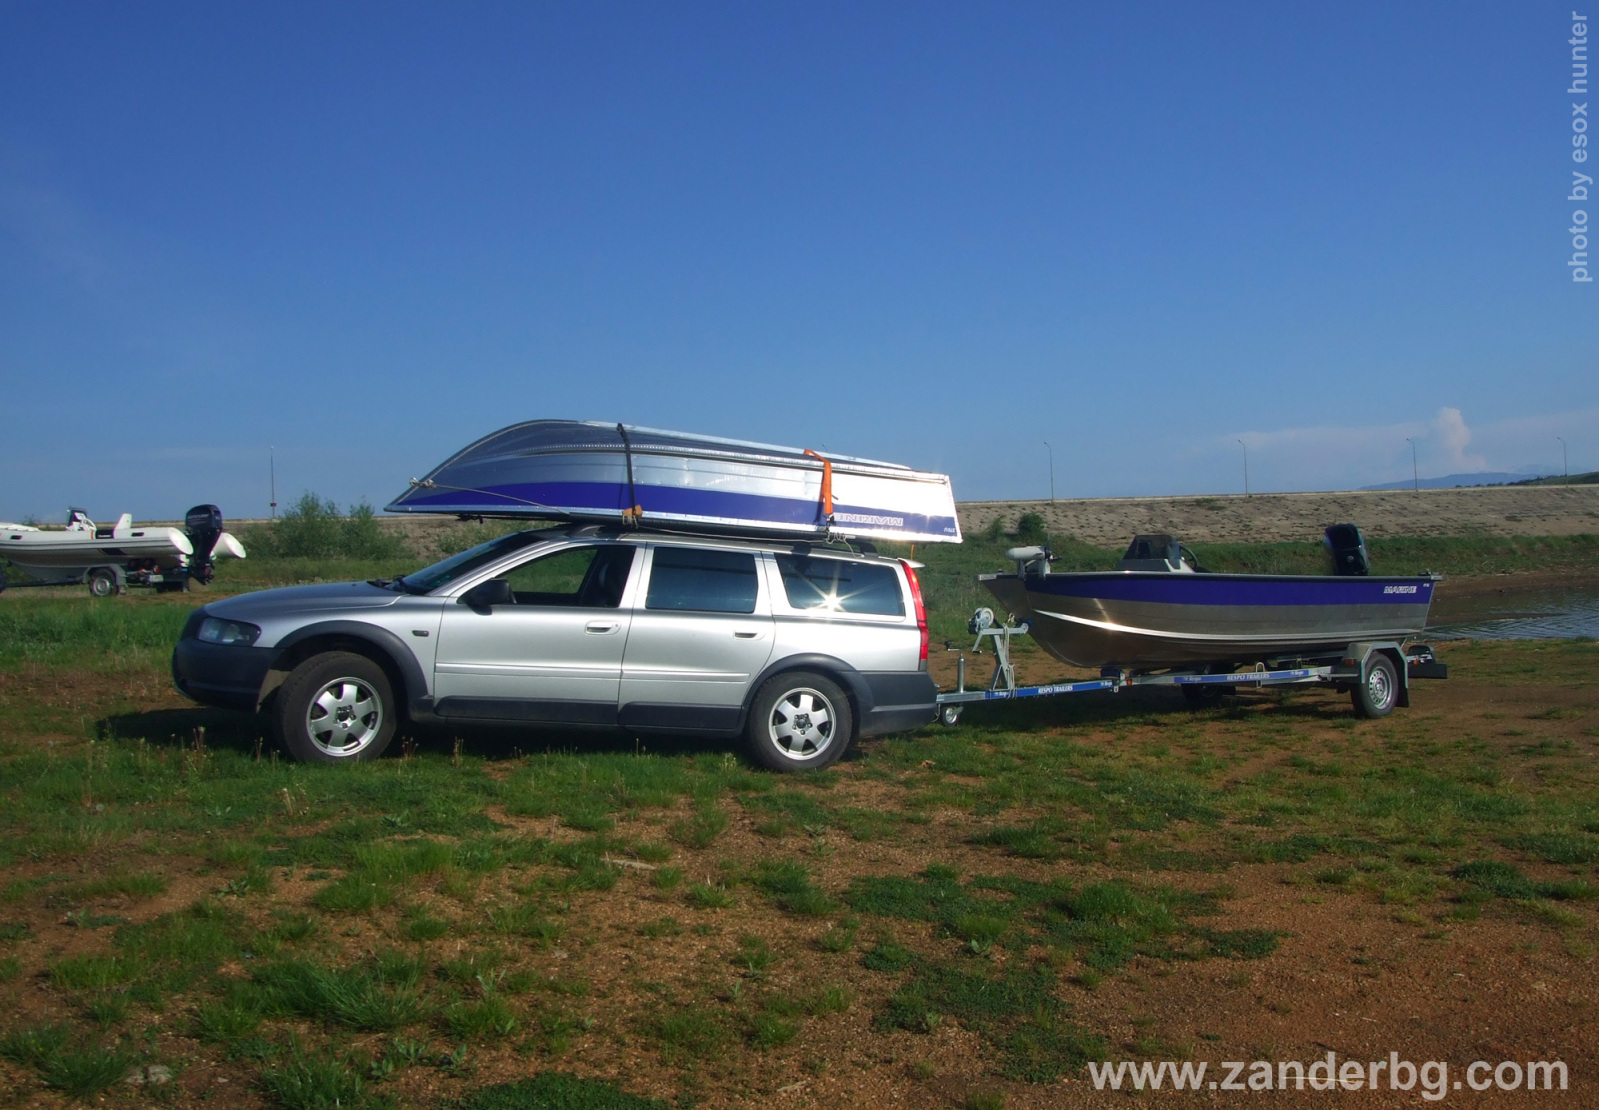 ZANDER надуваеми лодки, алуминиеви лодки и др. - Page 7 2zqhd29